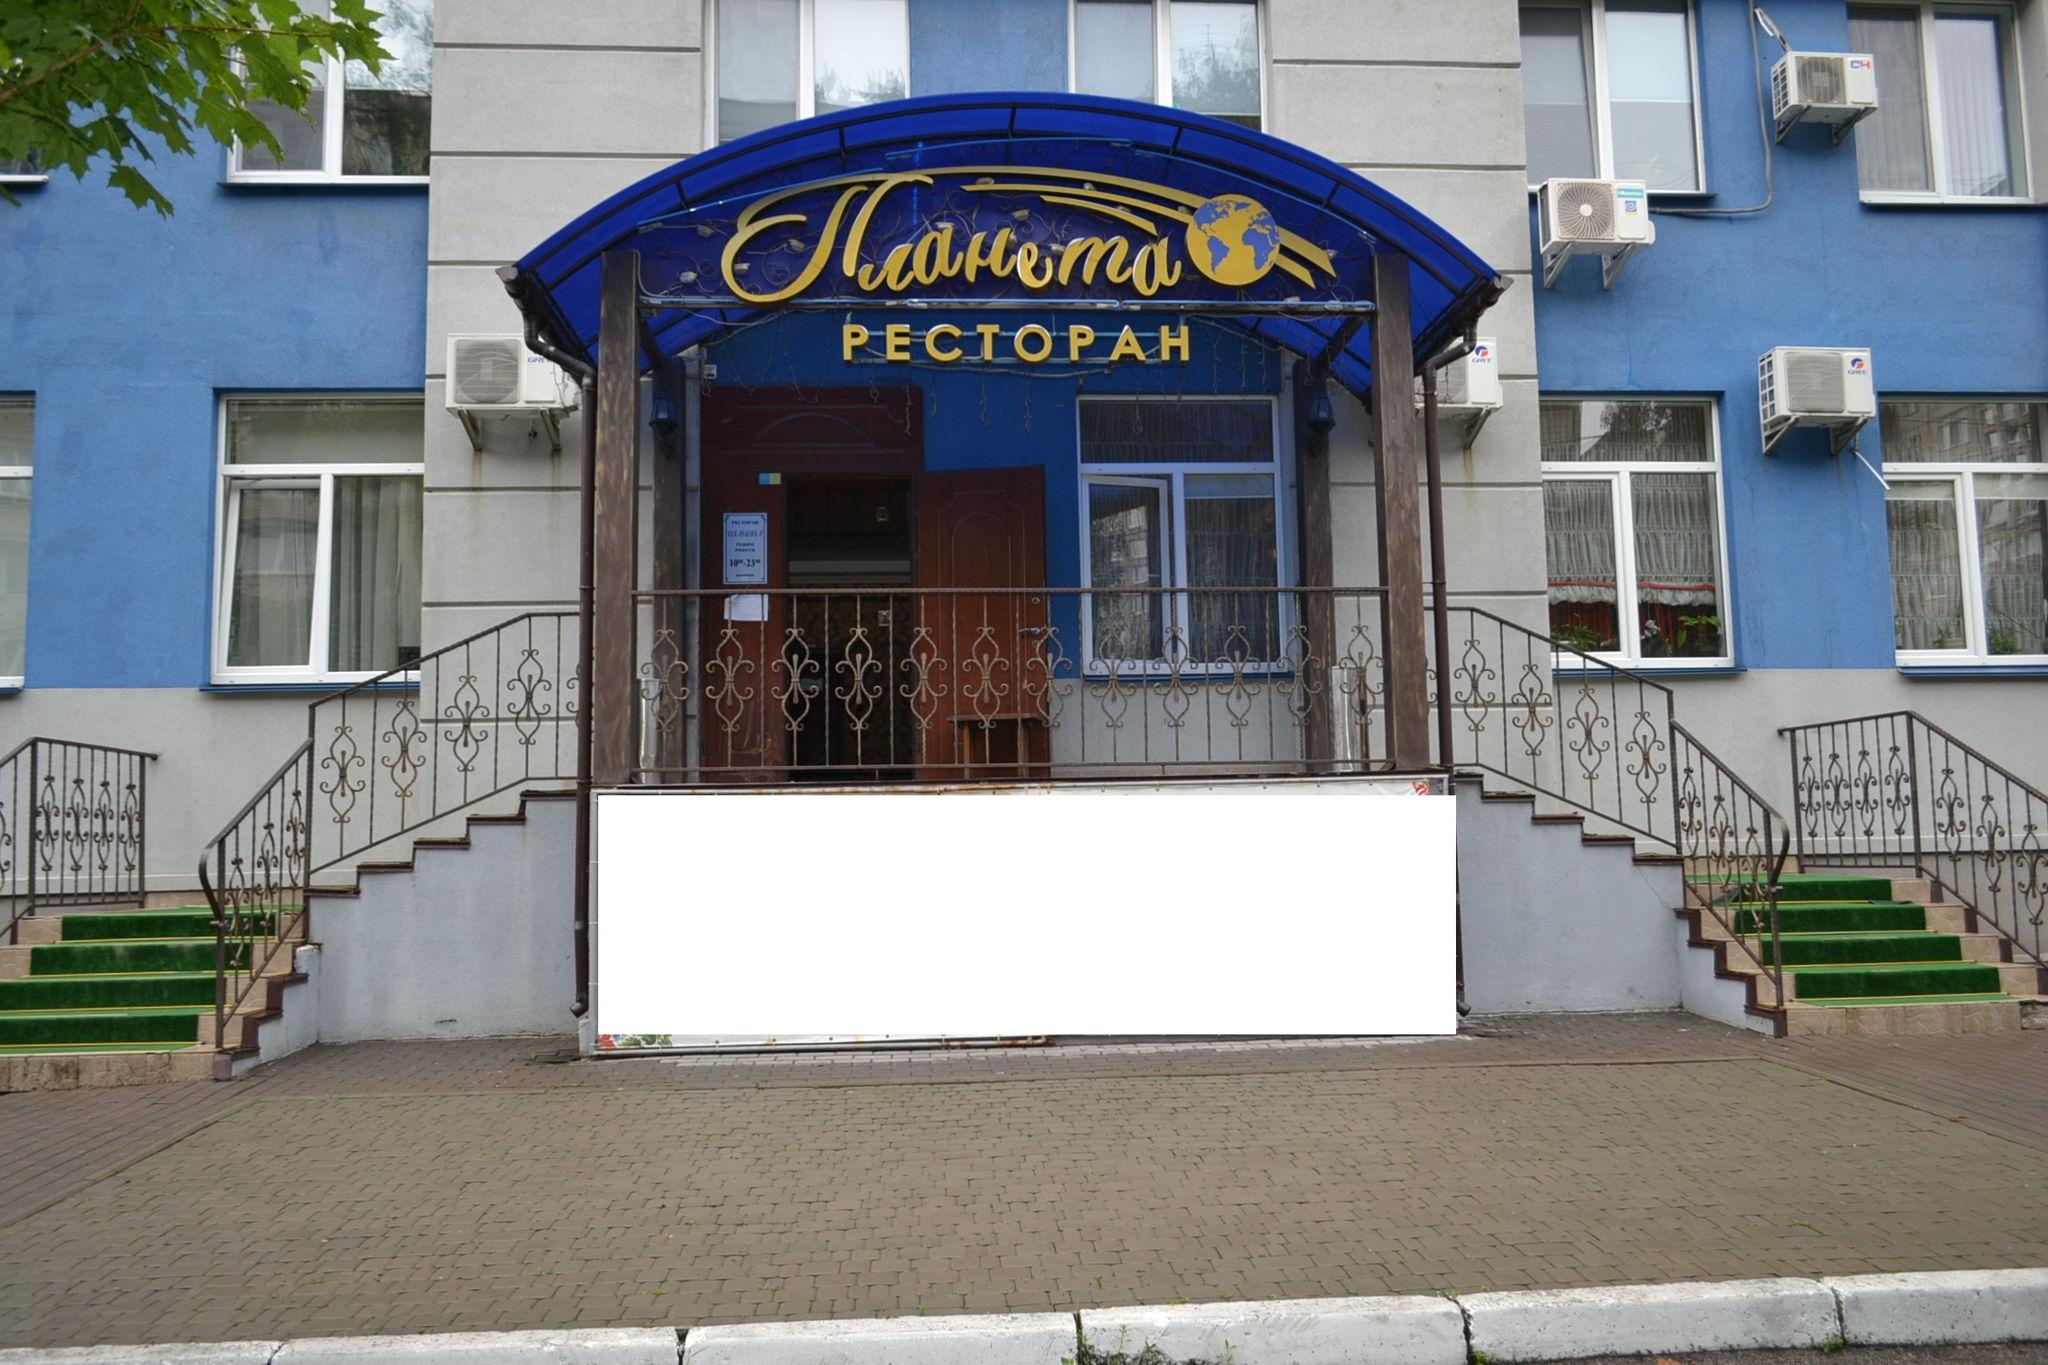 Ресторан, W-5563321, Чаадаева Петра, 2, Киев - Фото 6